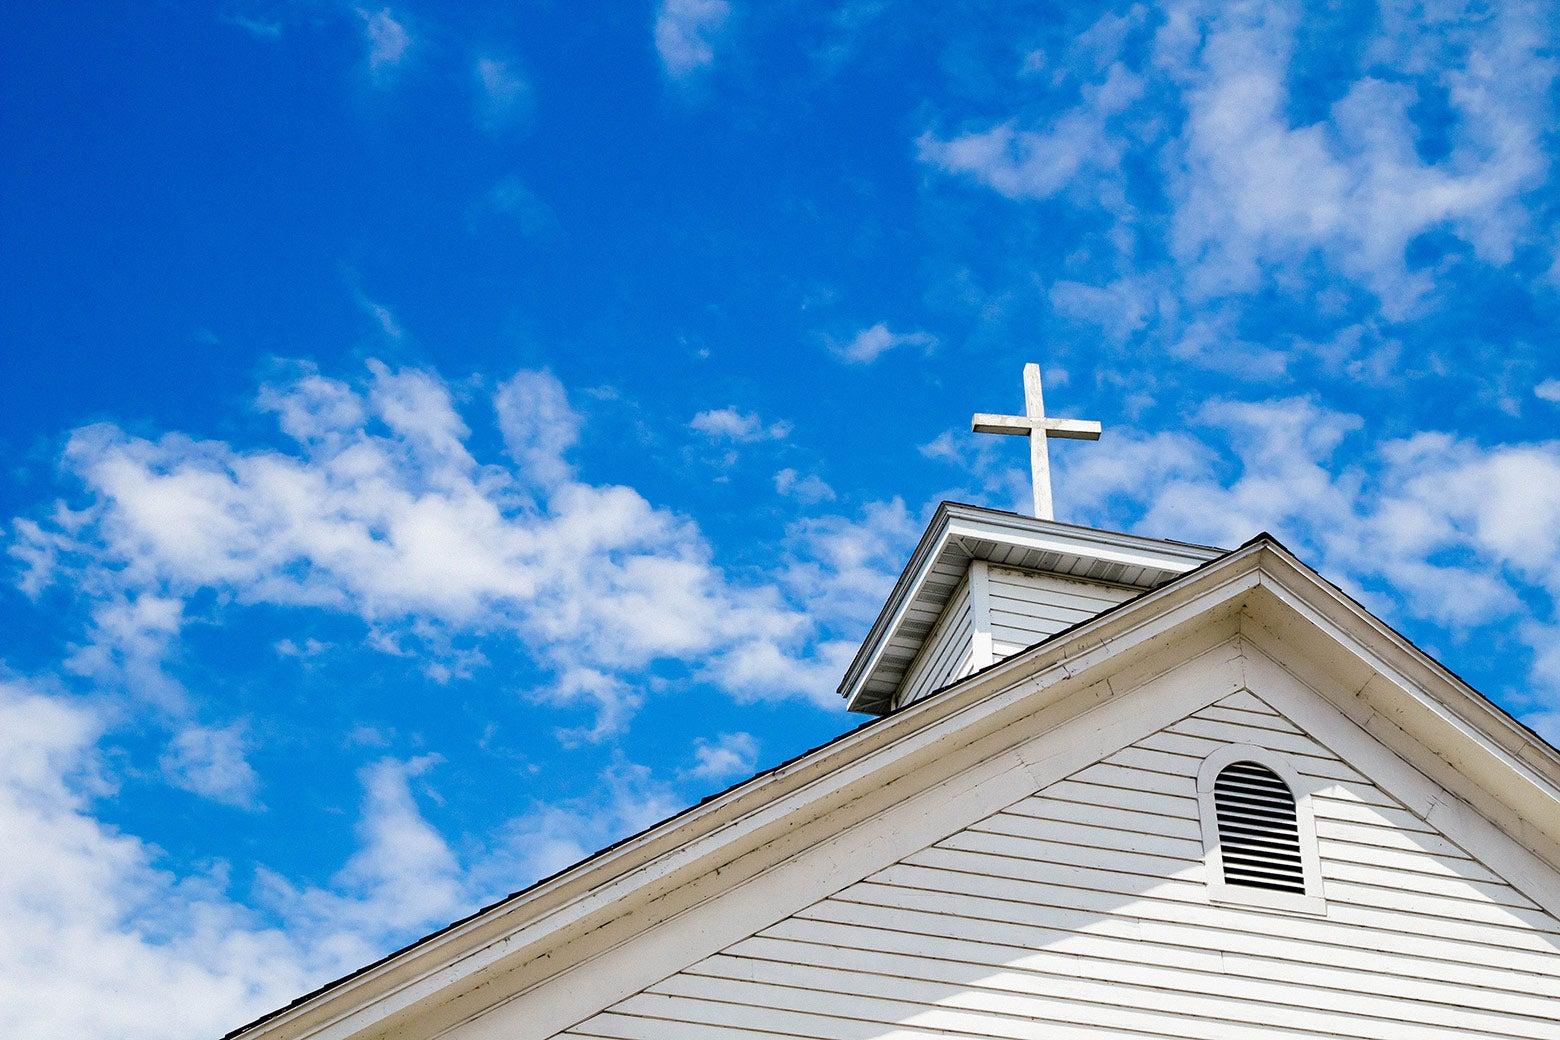 Top of a church against a blue sky.